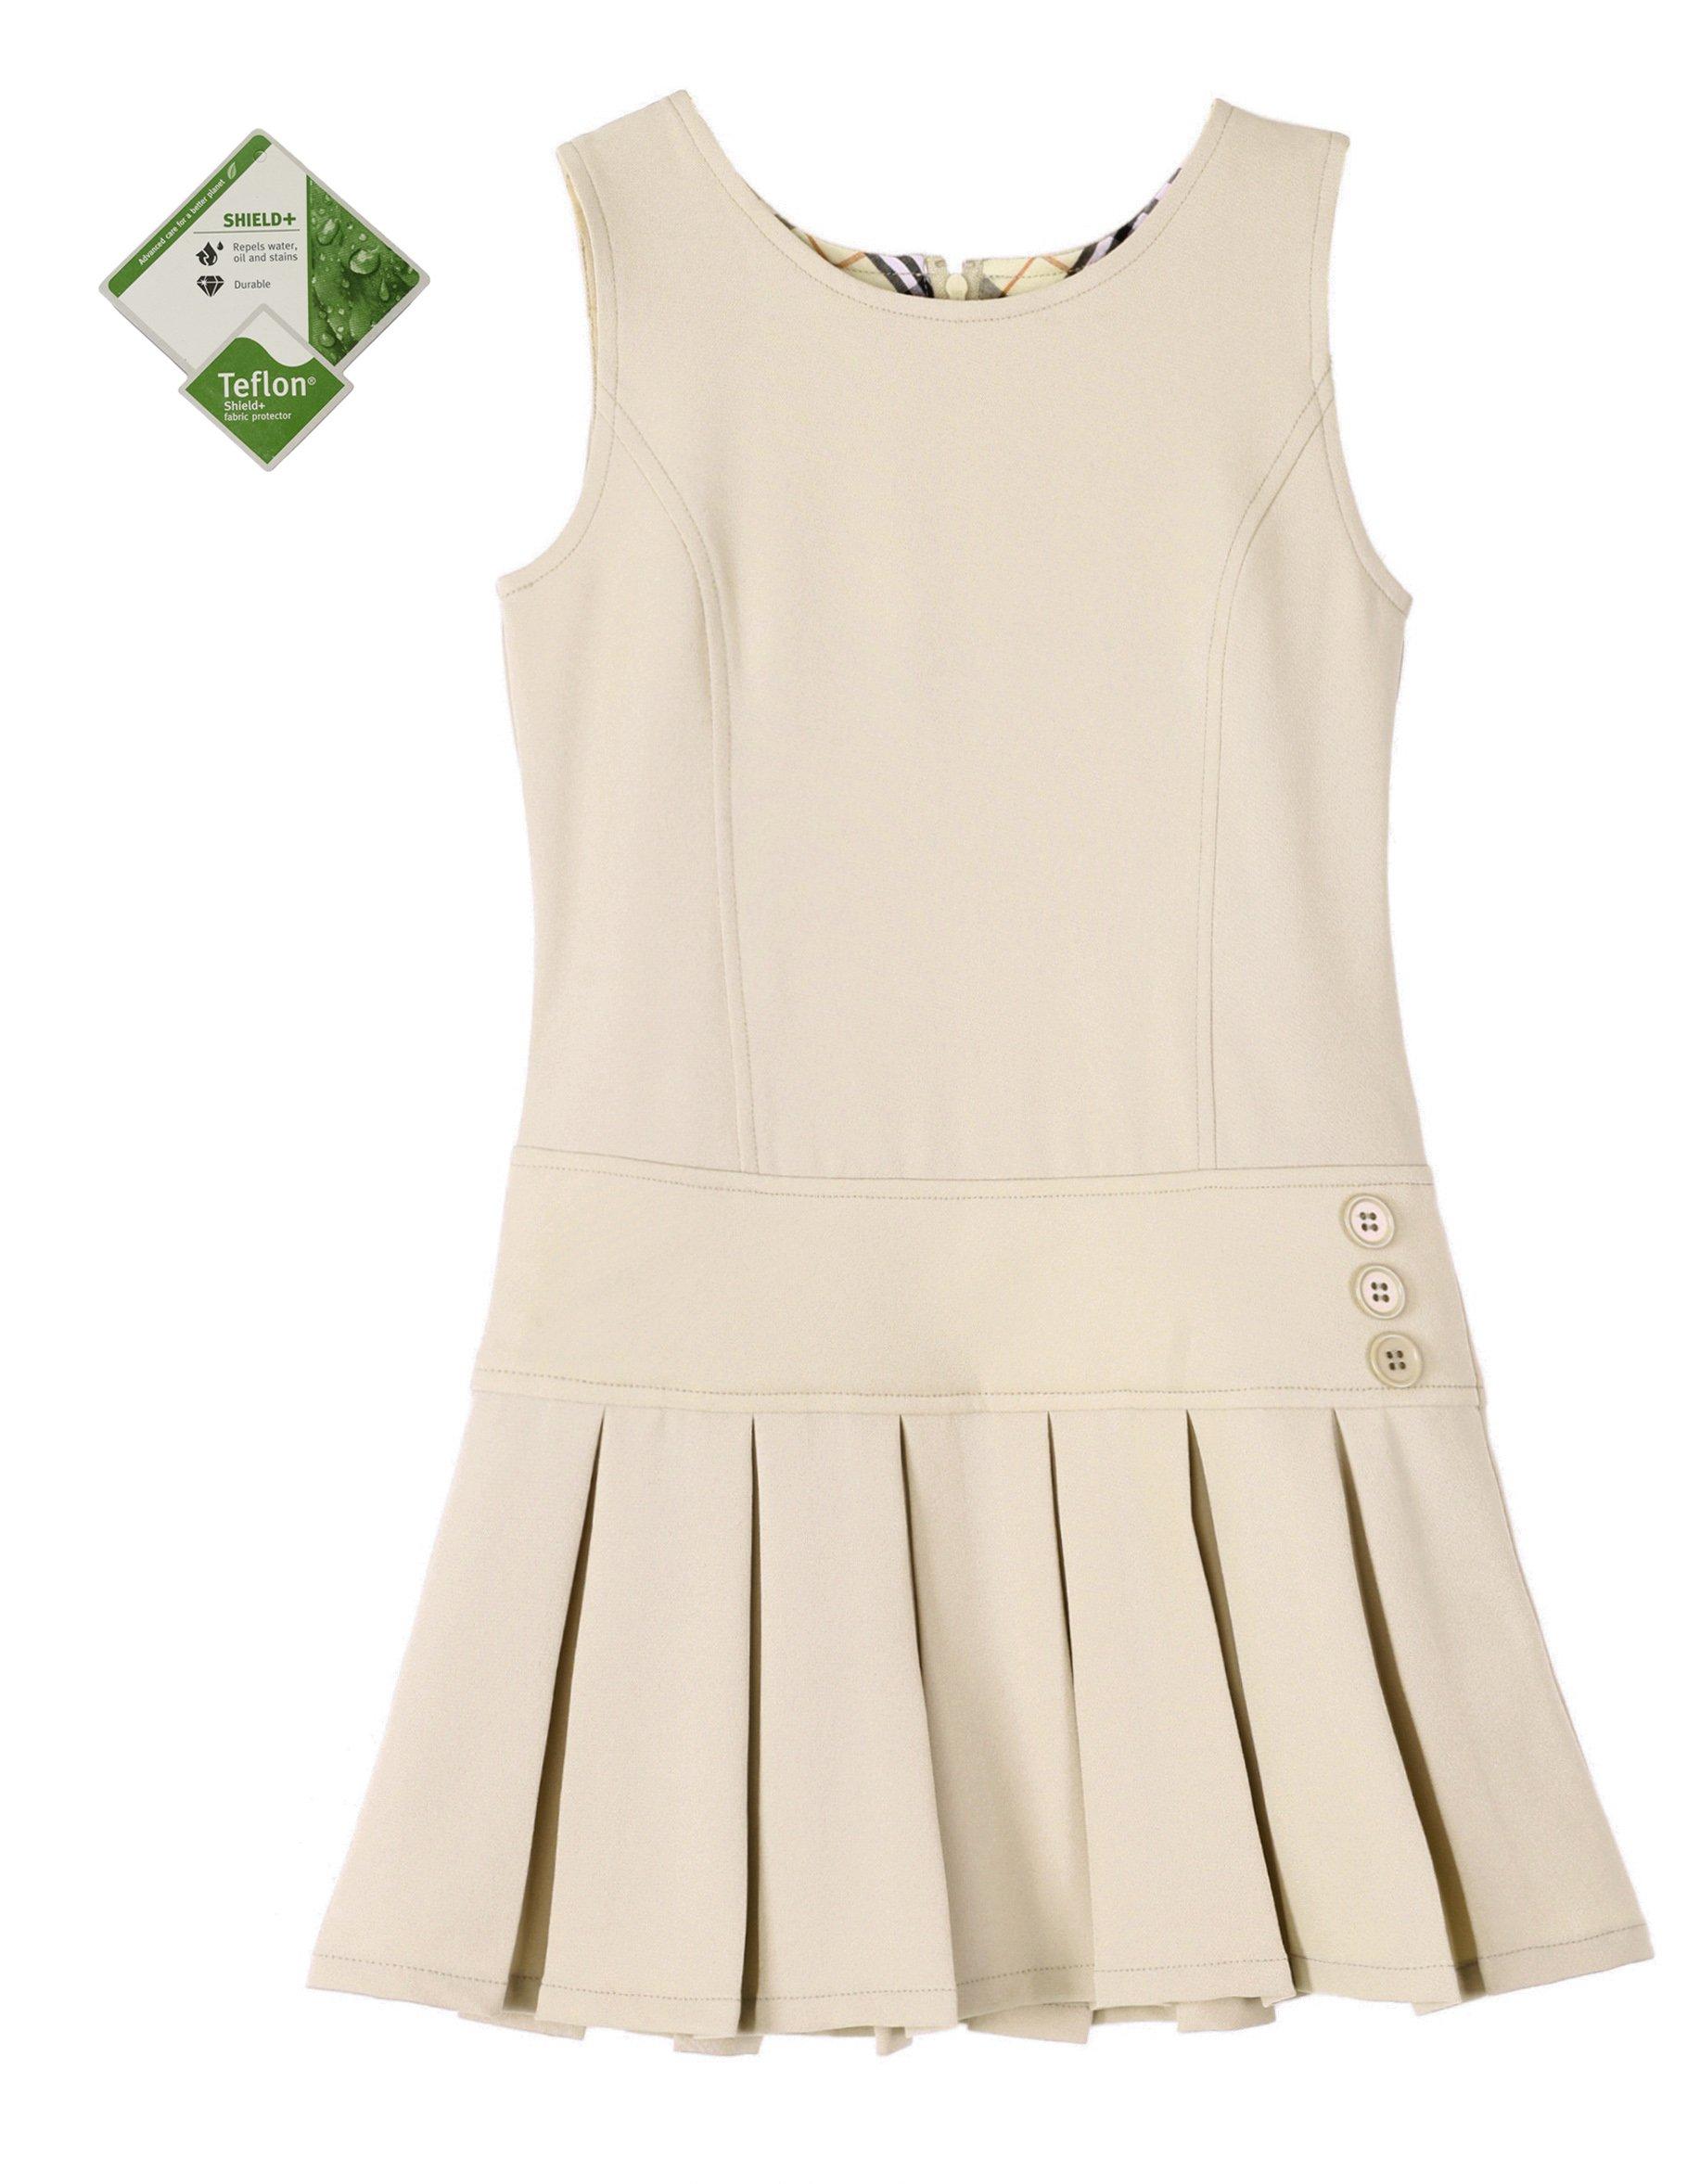 Bienzoe Girl's Stretchy Pleated Durable School Uniforms Jumper Khaki 6